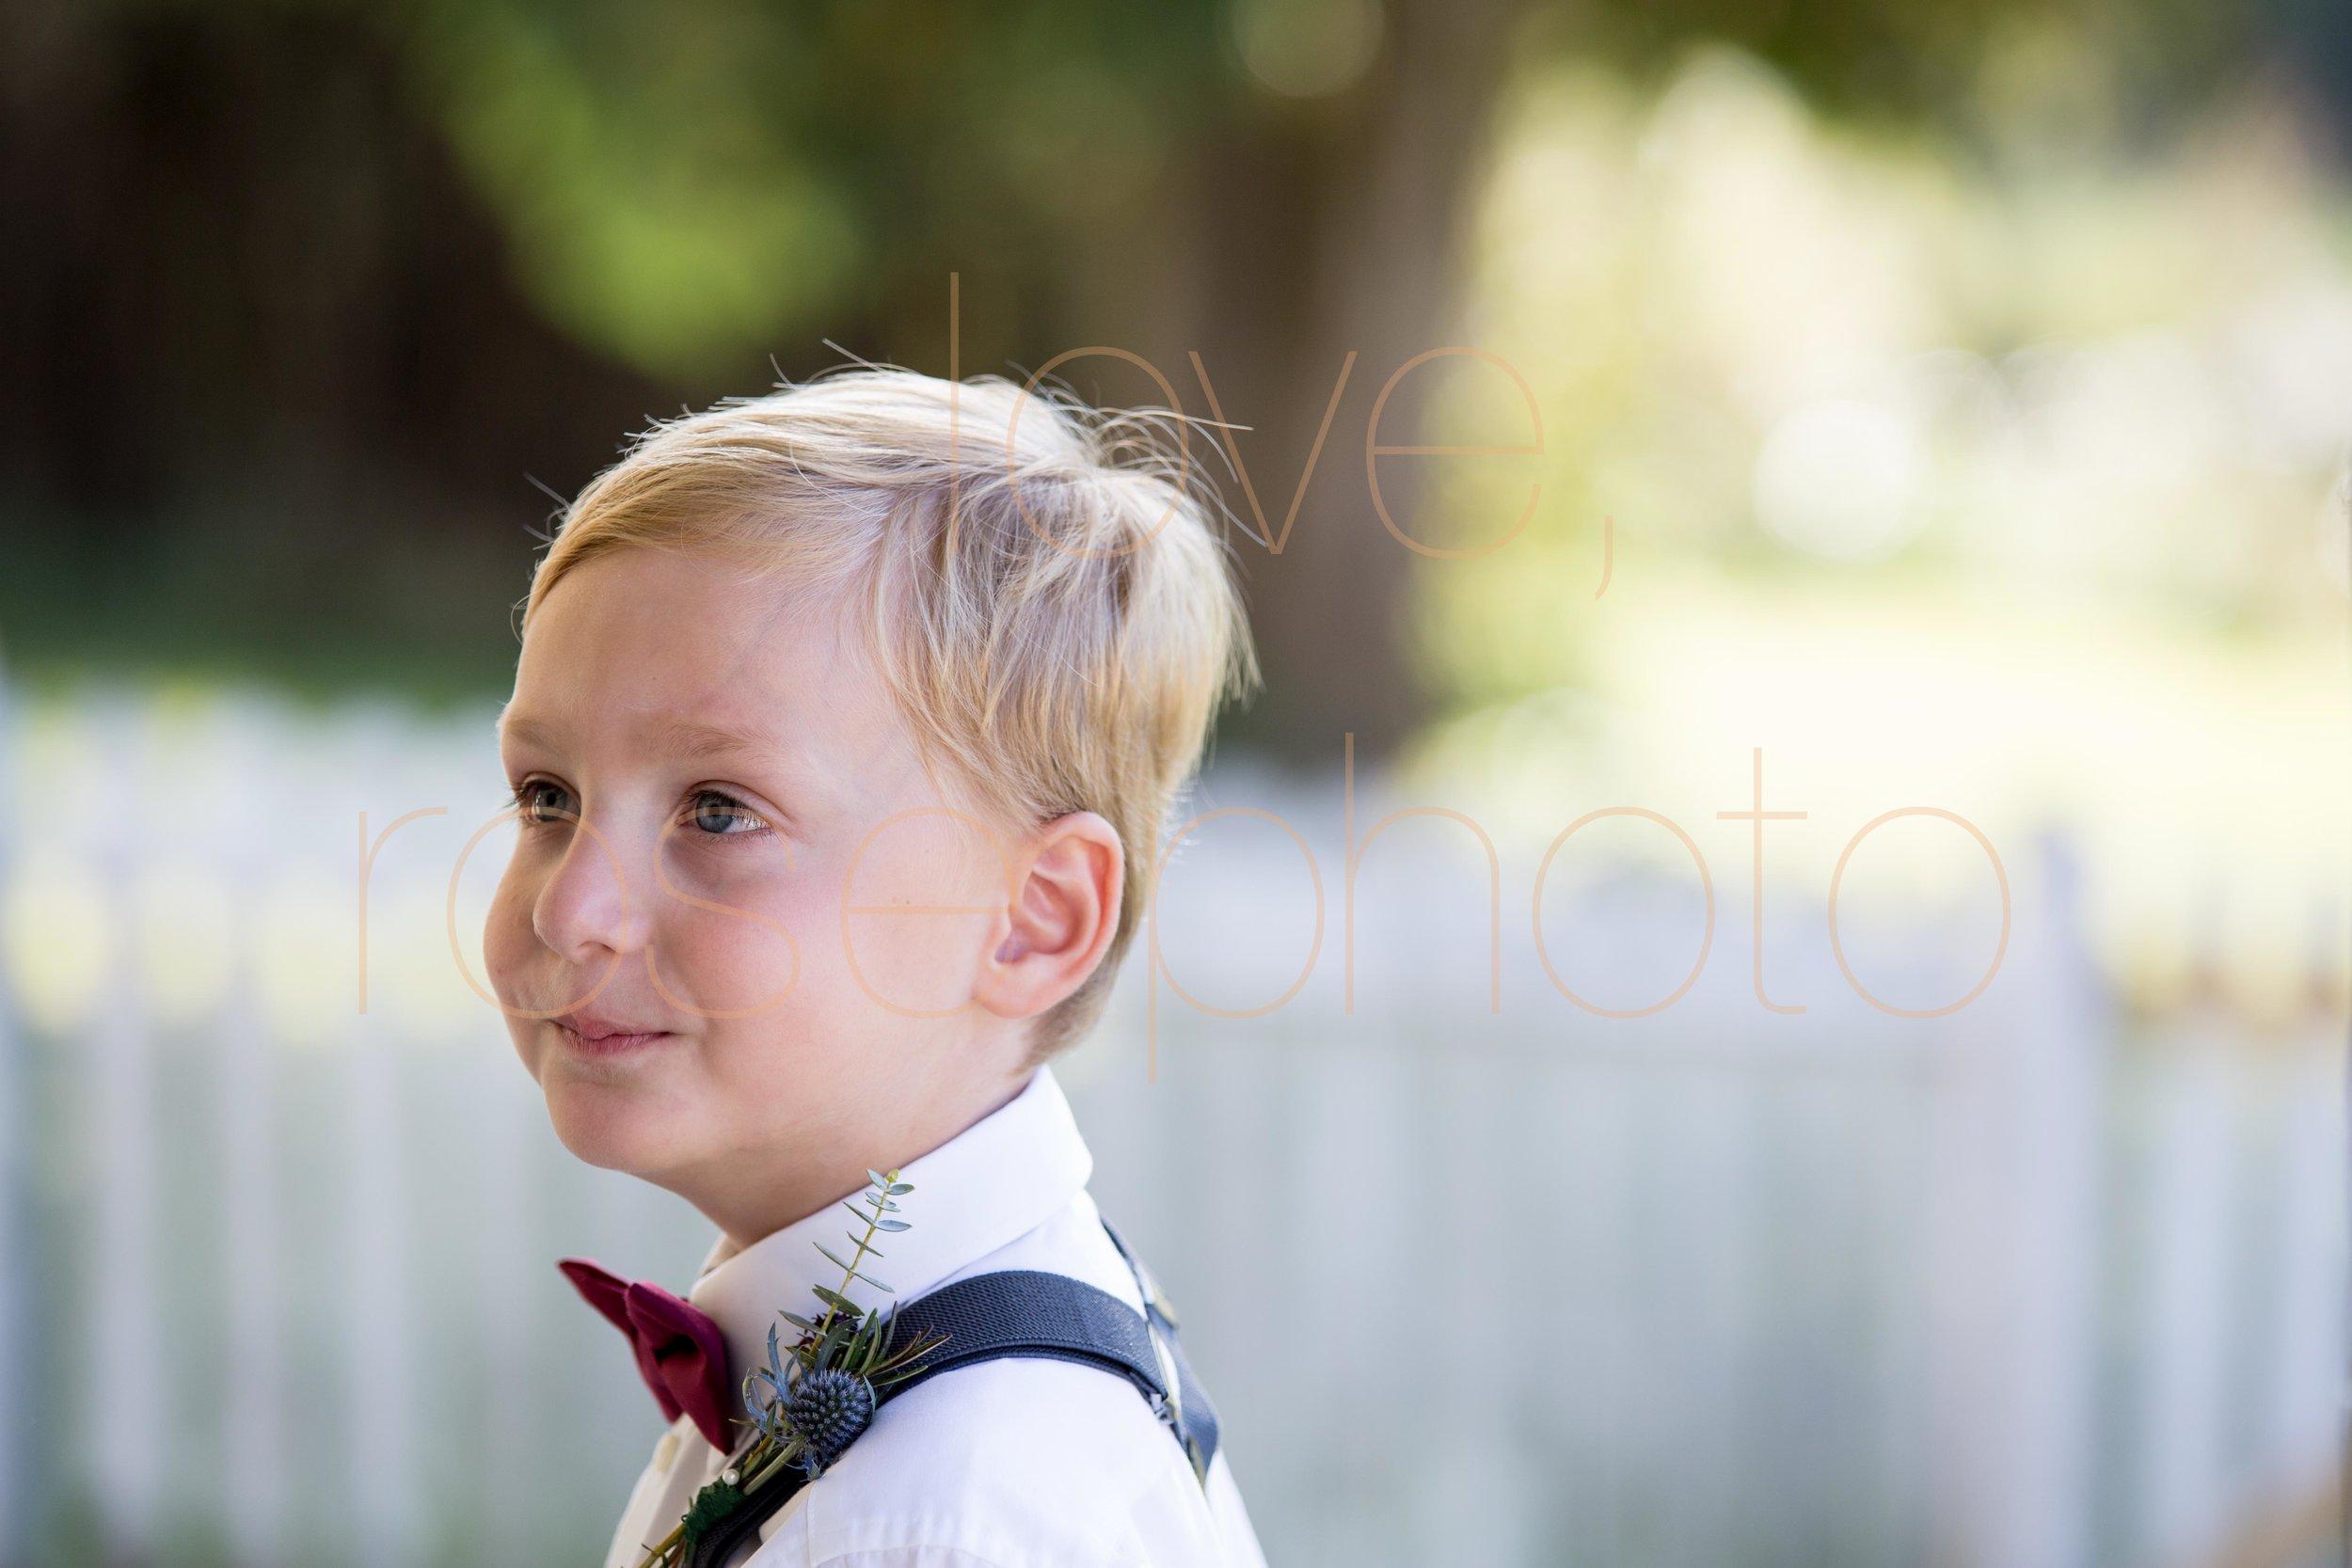 Jane Krame + Jason Ashevegas married asheville best wedding photographers -36.jpg